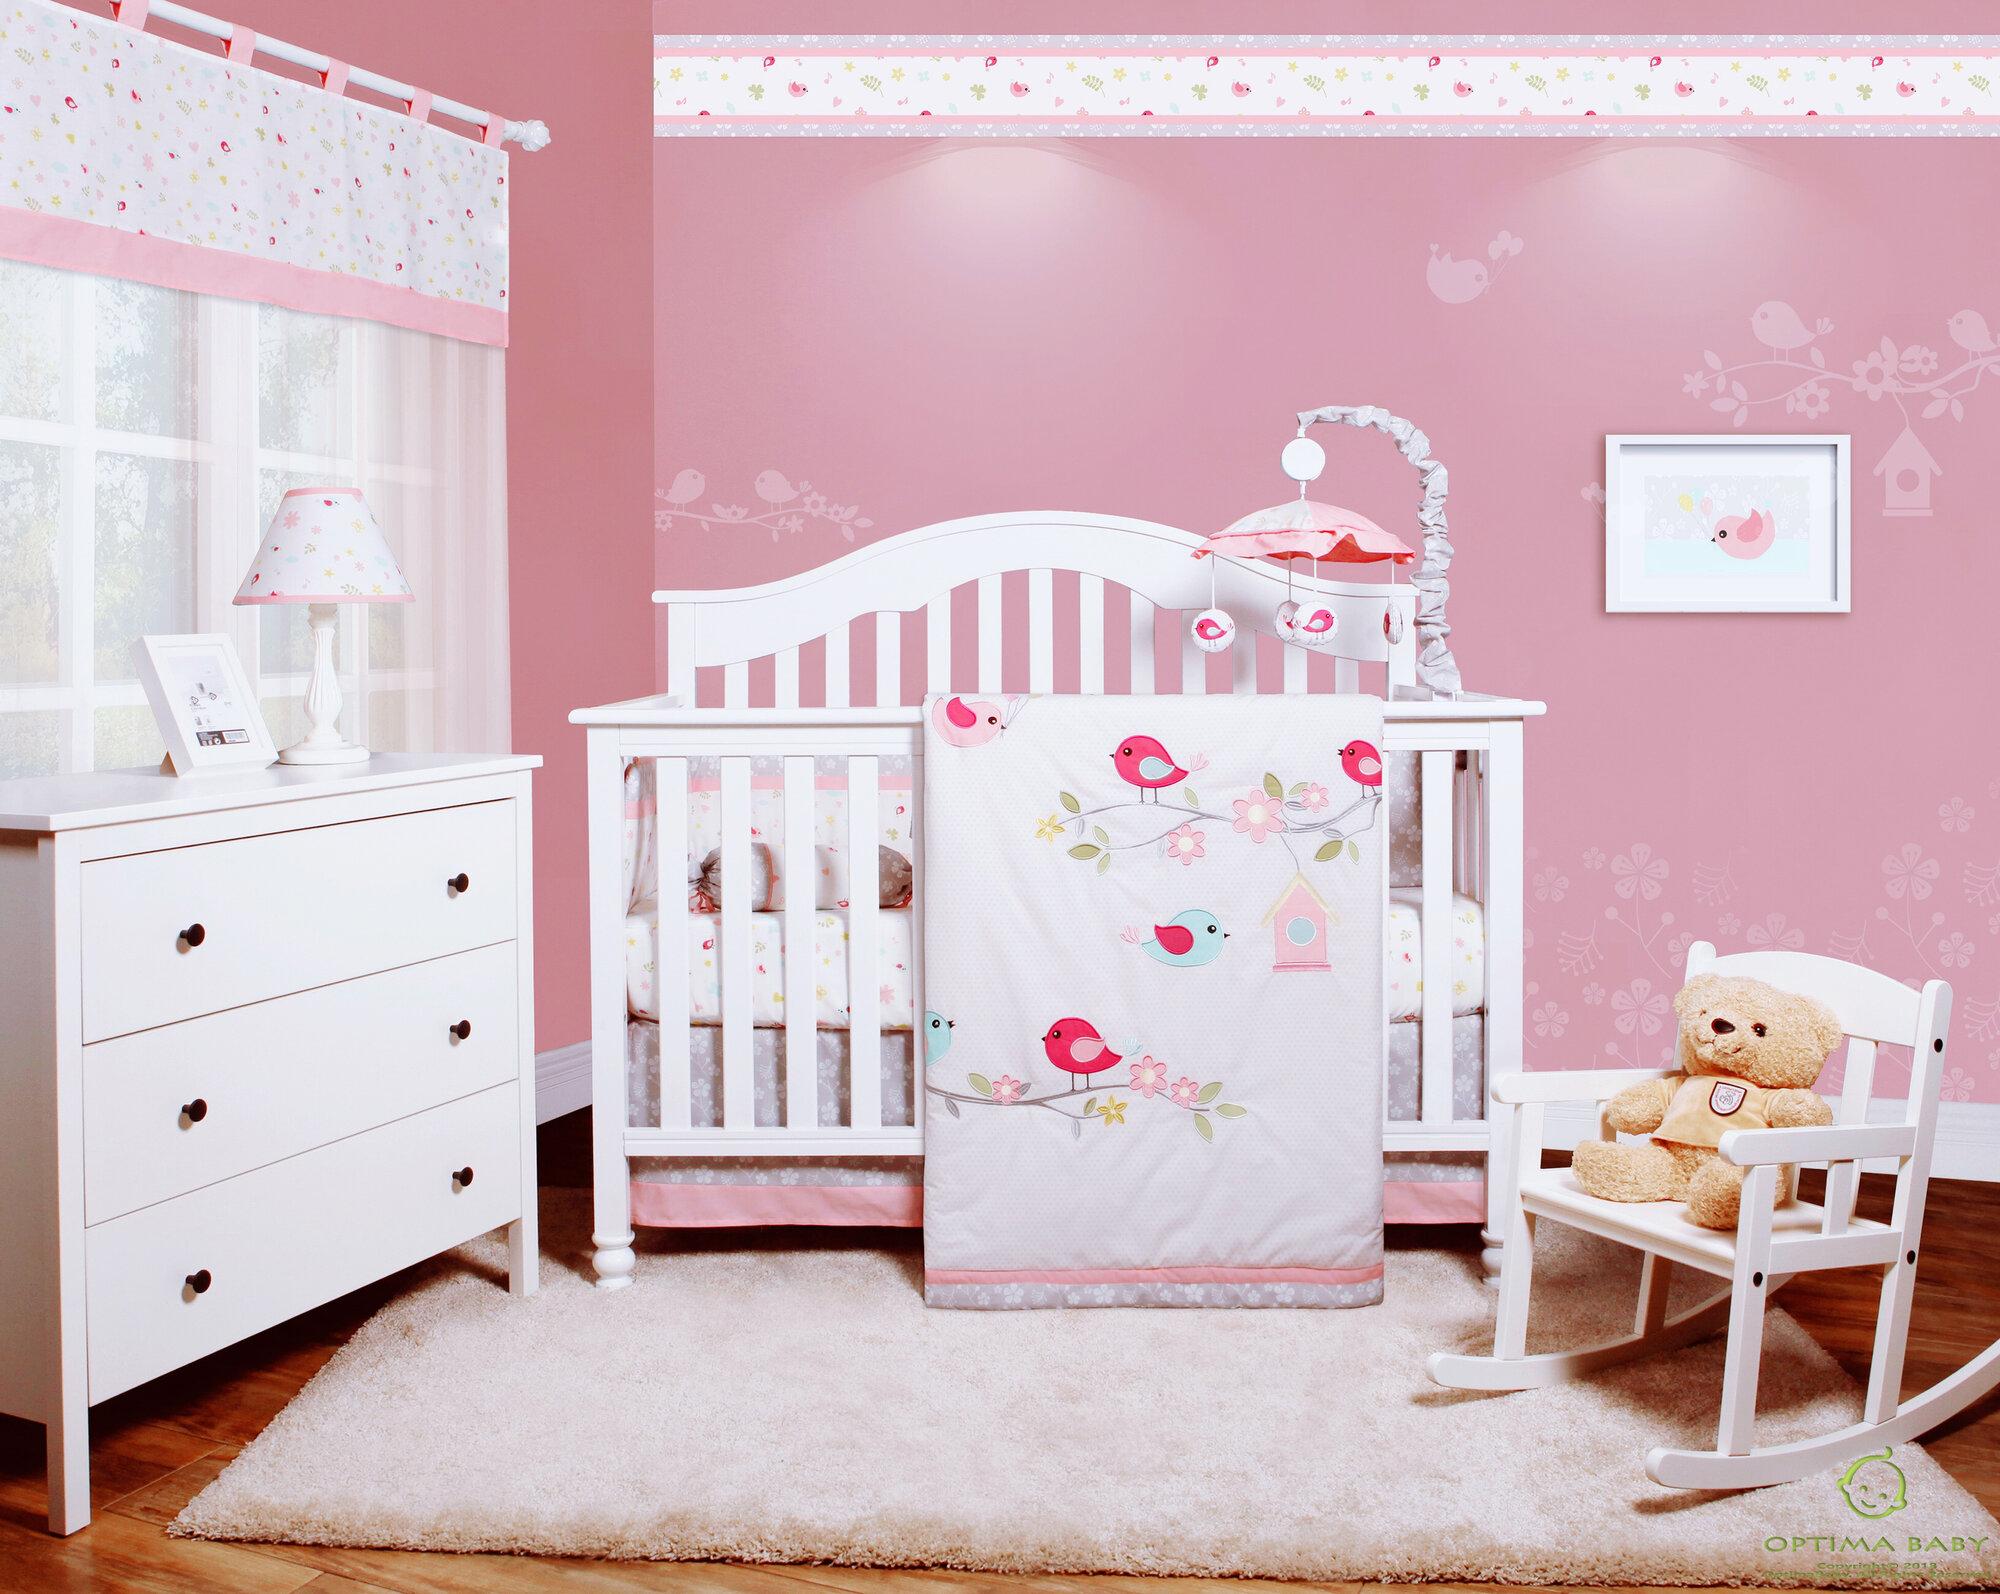 eb25f443370c2 Donaway Happy Enchanted Birds 6 Piece Baby Girl Nursery Crib Bedding Set.  OUR SKU  HRBE3638